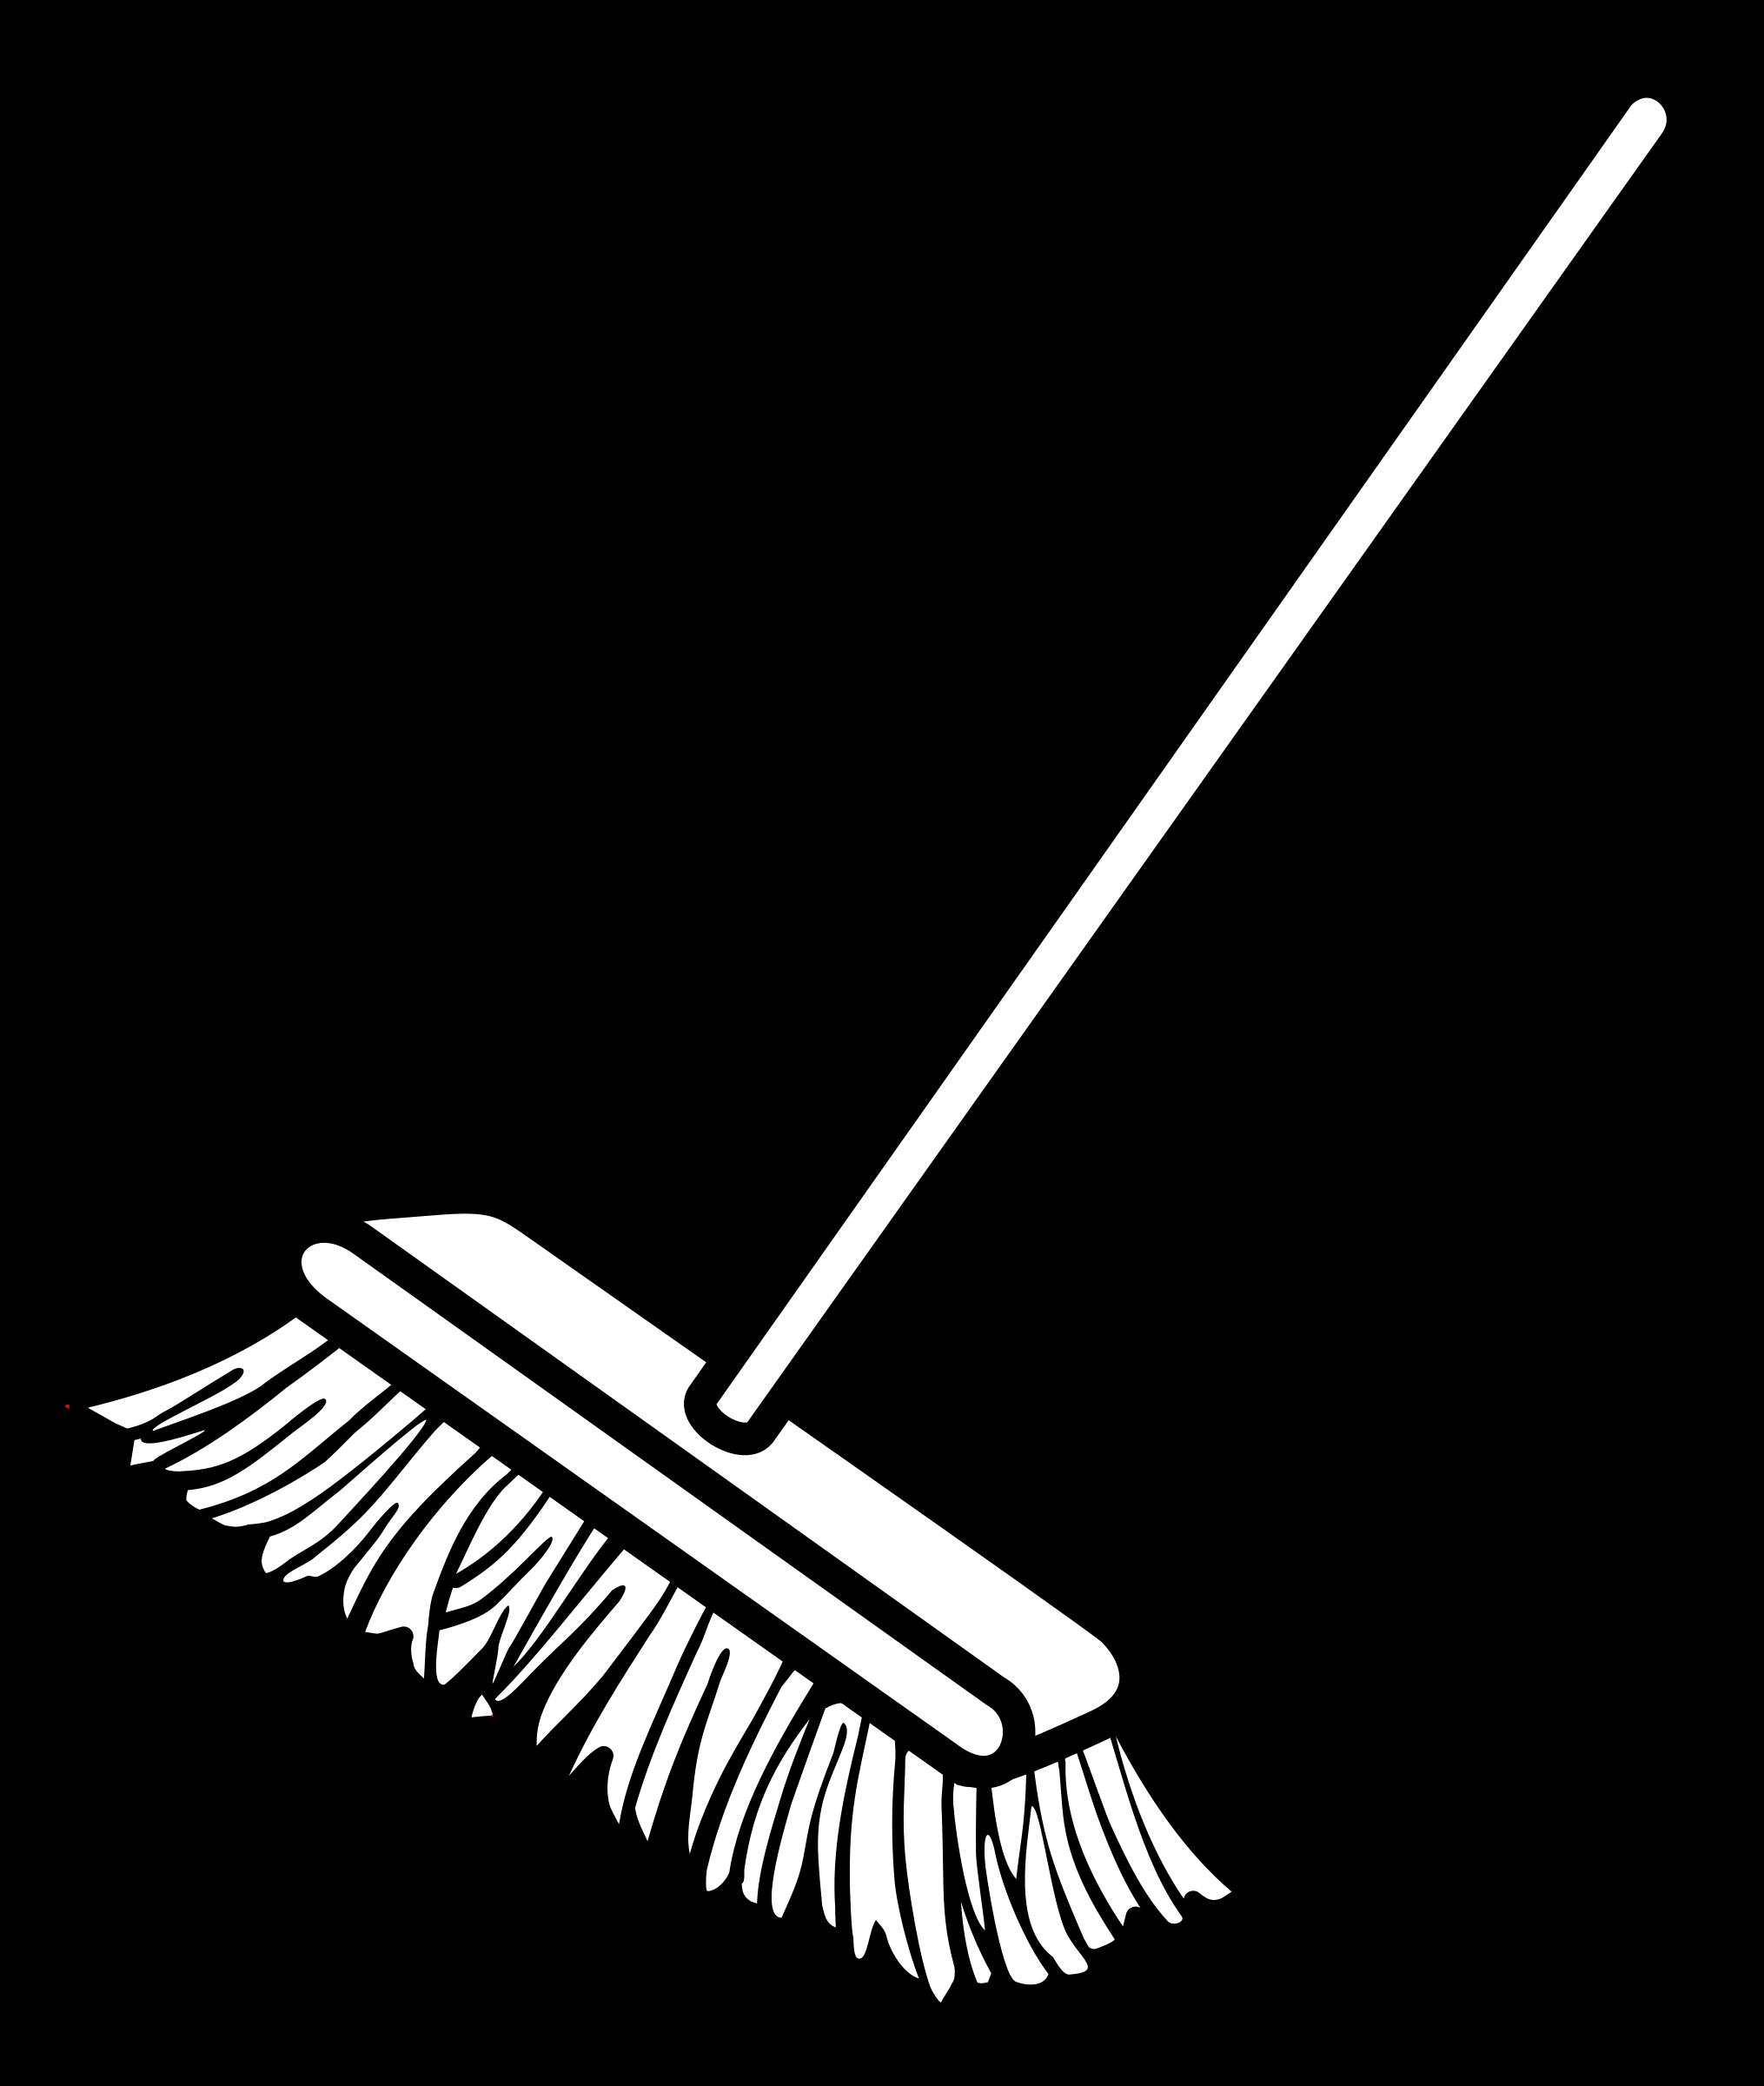 Black clipart broom Cliparts schliferaward Broom Clipart The